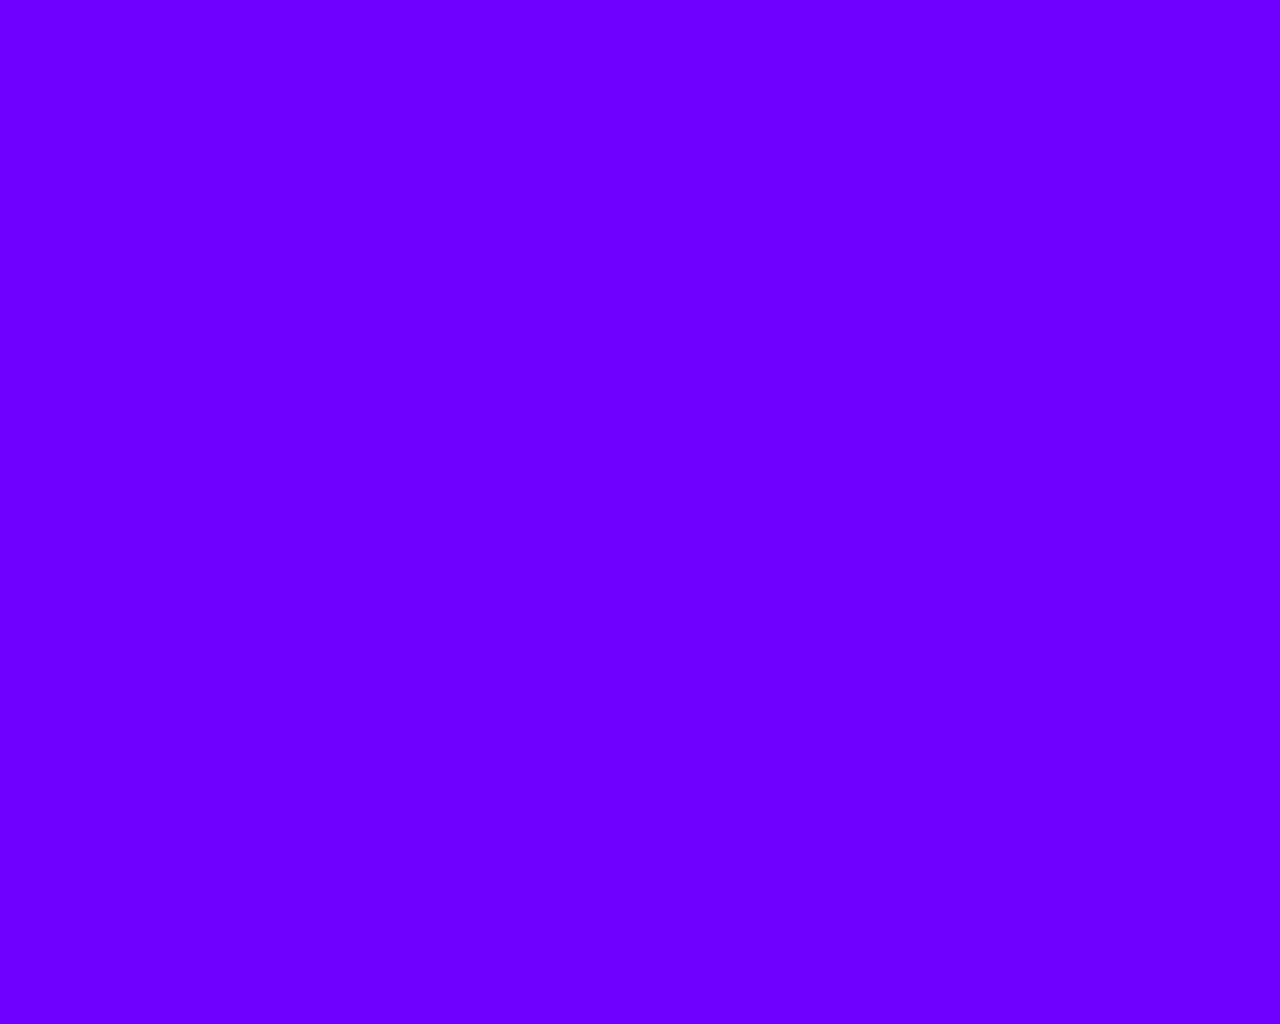 1280x1024 Electric Indigo Solid Color Background